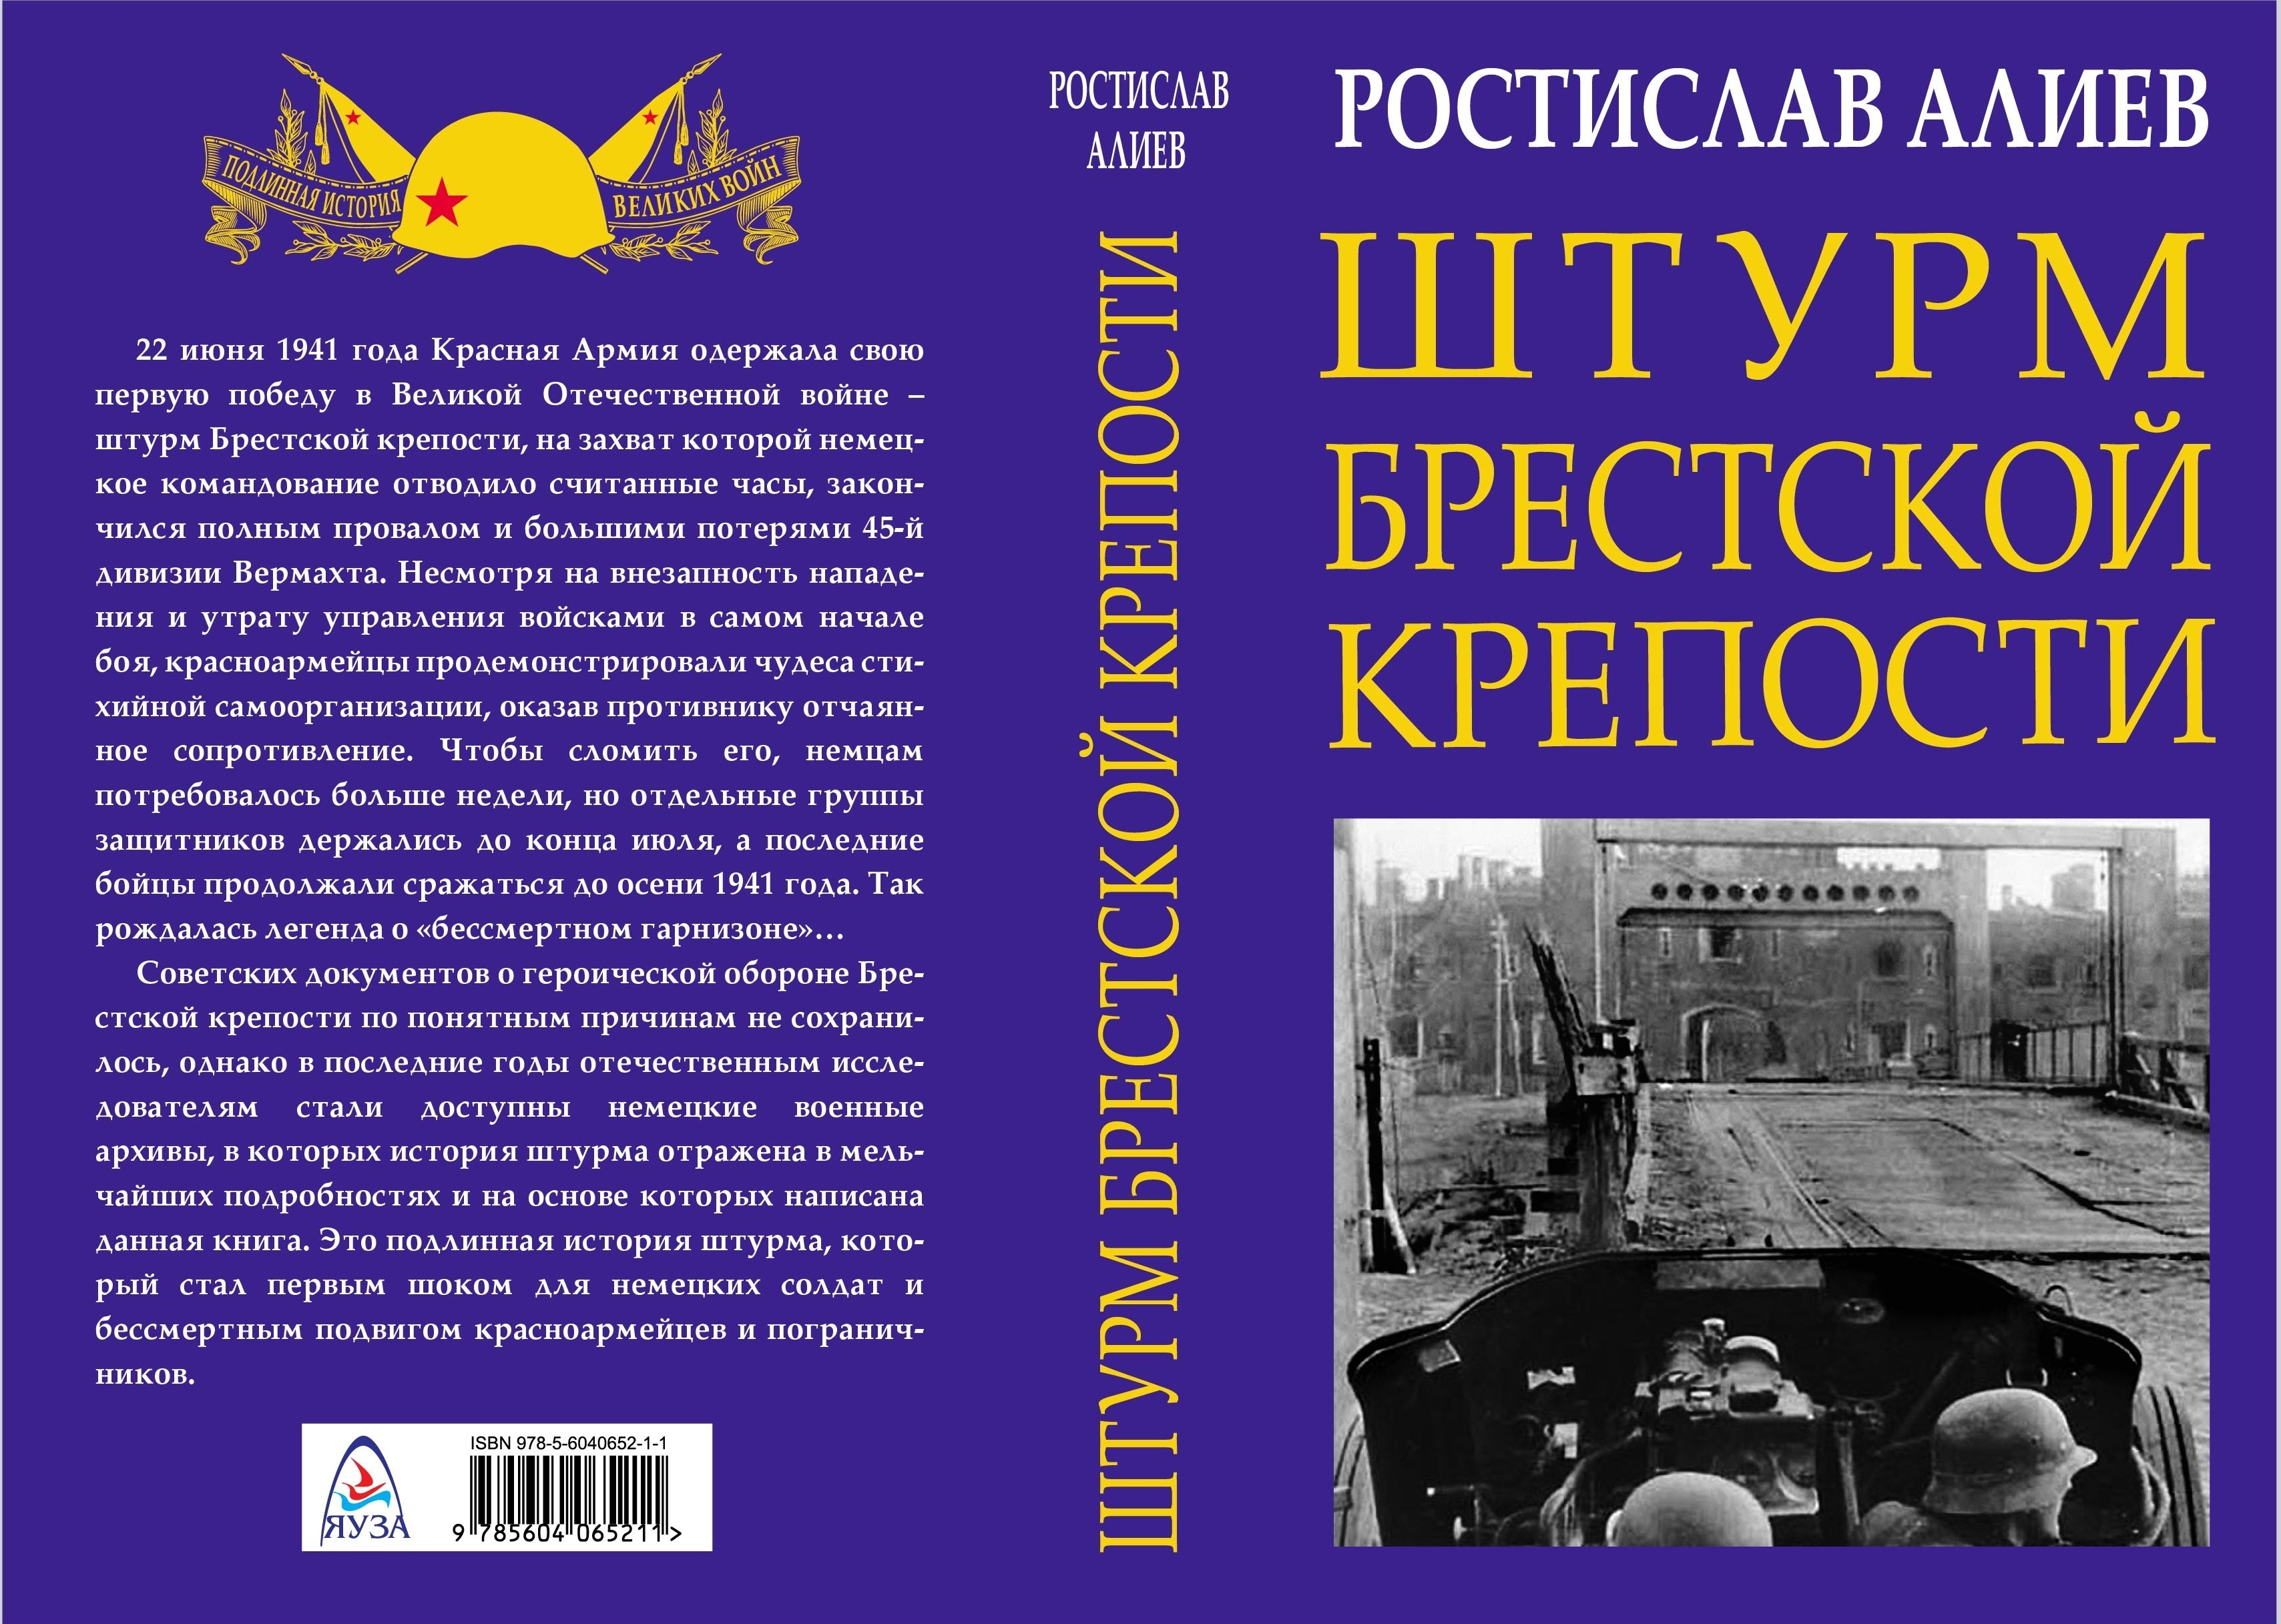 Алиев Ростислав Штурм Брестской крепости отсутствует осада и штурм текинской крепости геок тепе